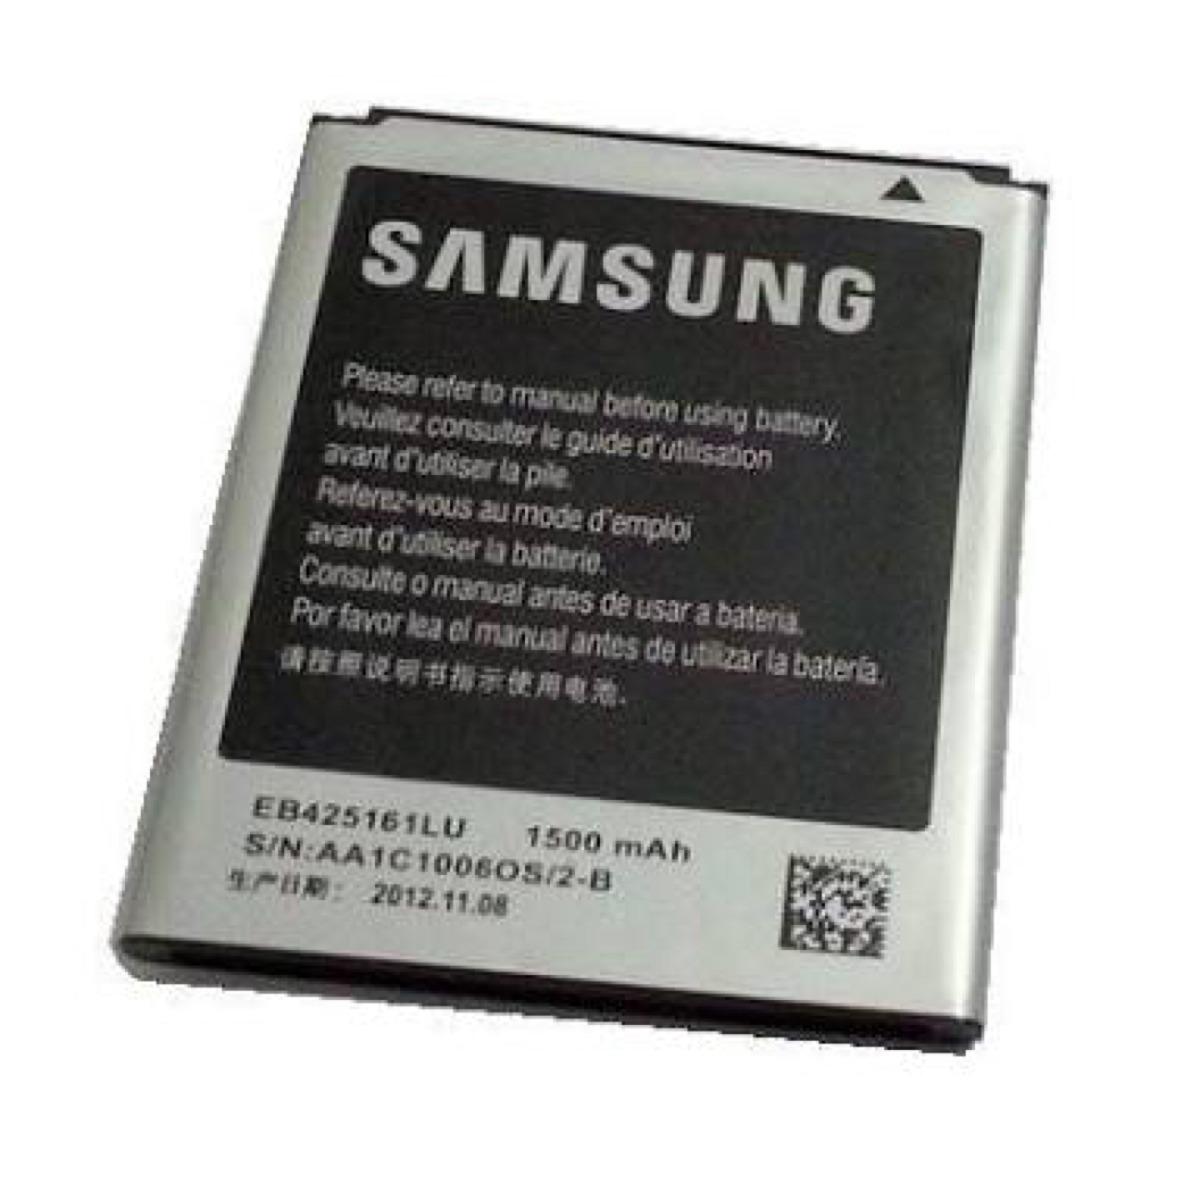 Bateria Samsung Galaxy S3 Mini I8190 1500 Mah - $ 160.00